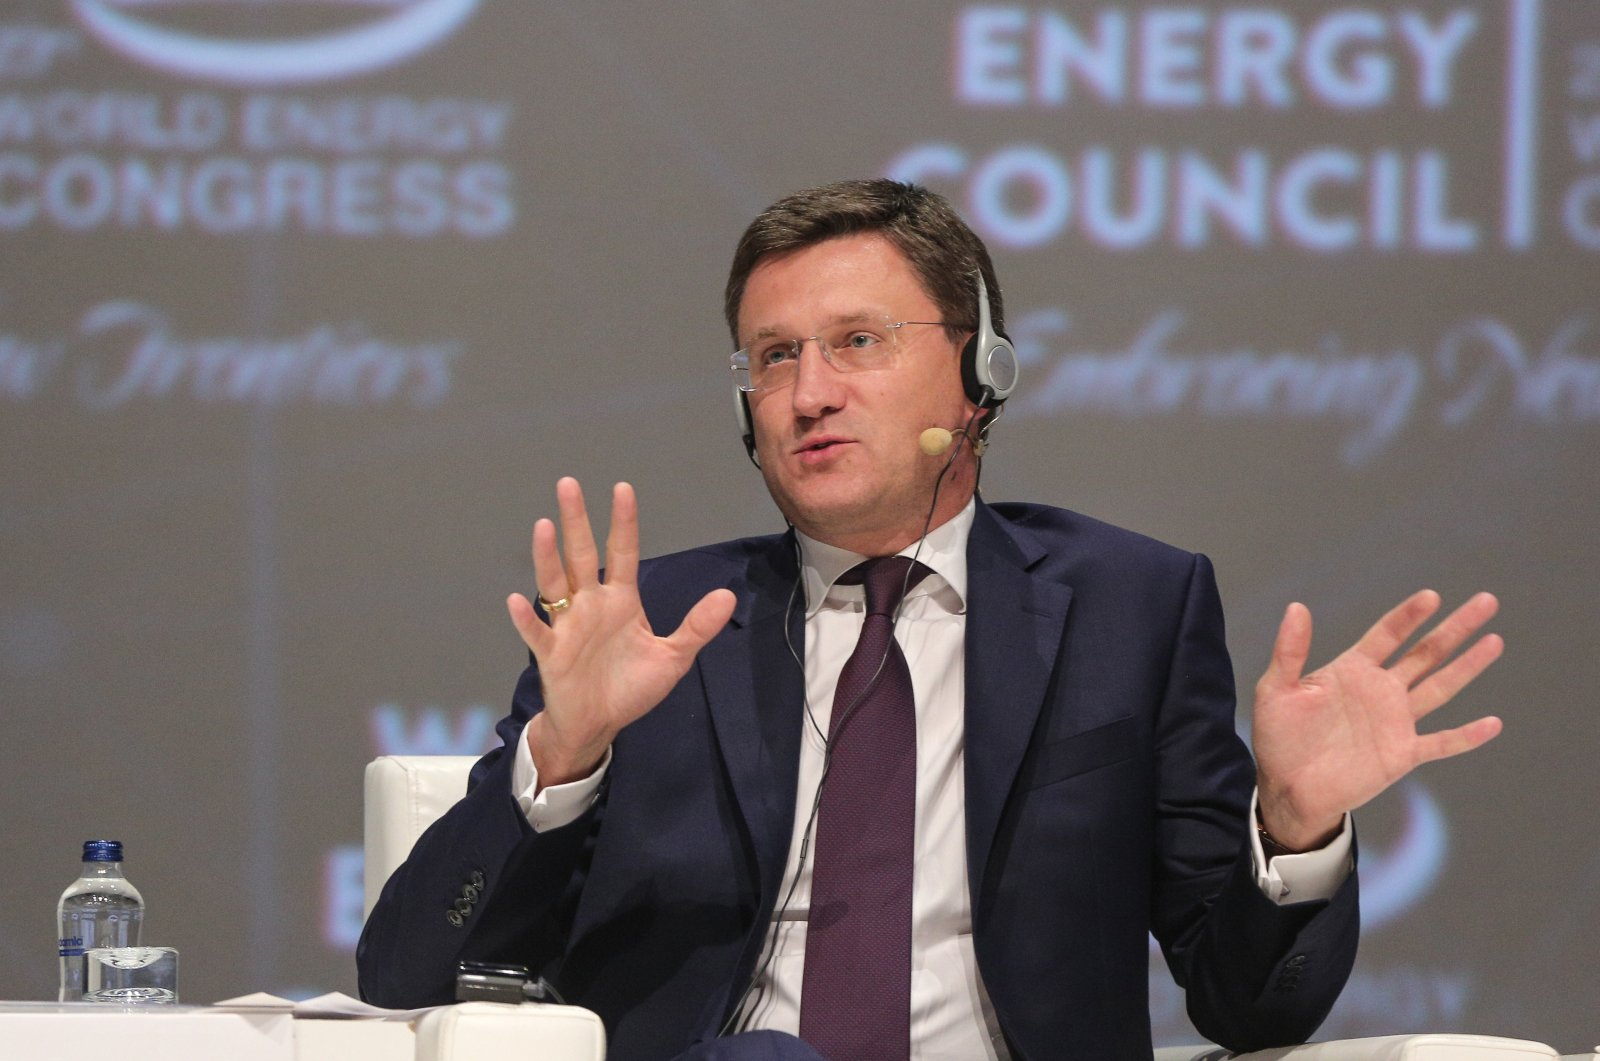 Russian Energy Minister Alexander Novak attends 23. World Energy Council in Istanbul Congress Center, Turkey, 2016. (AA Photo)